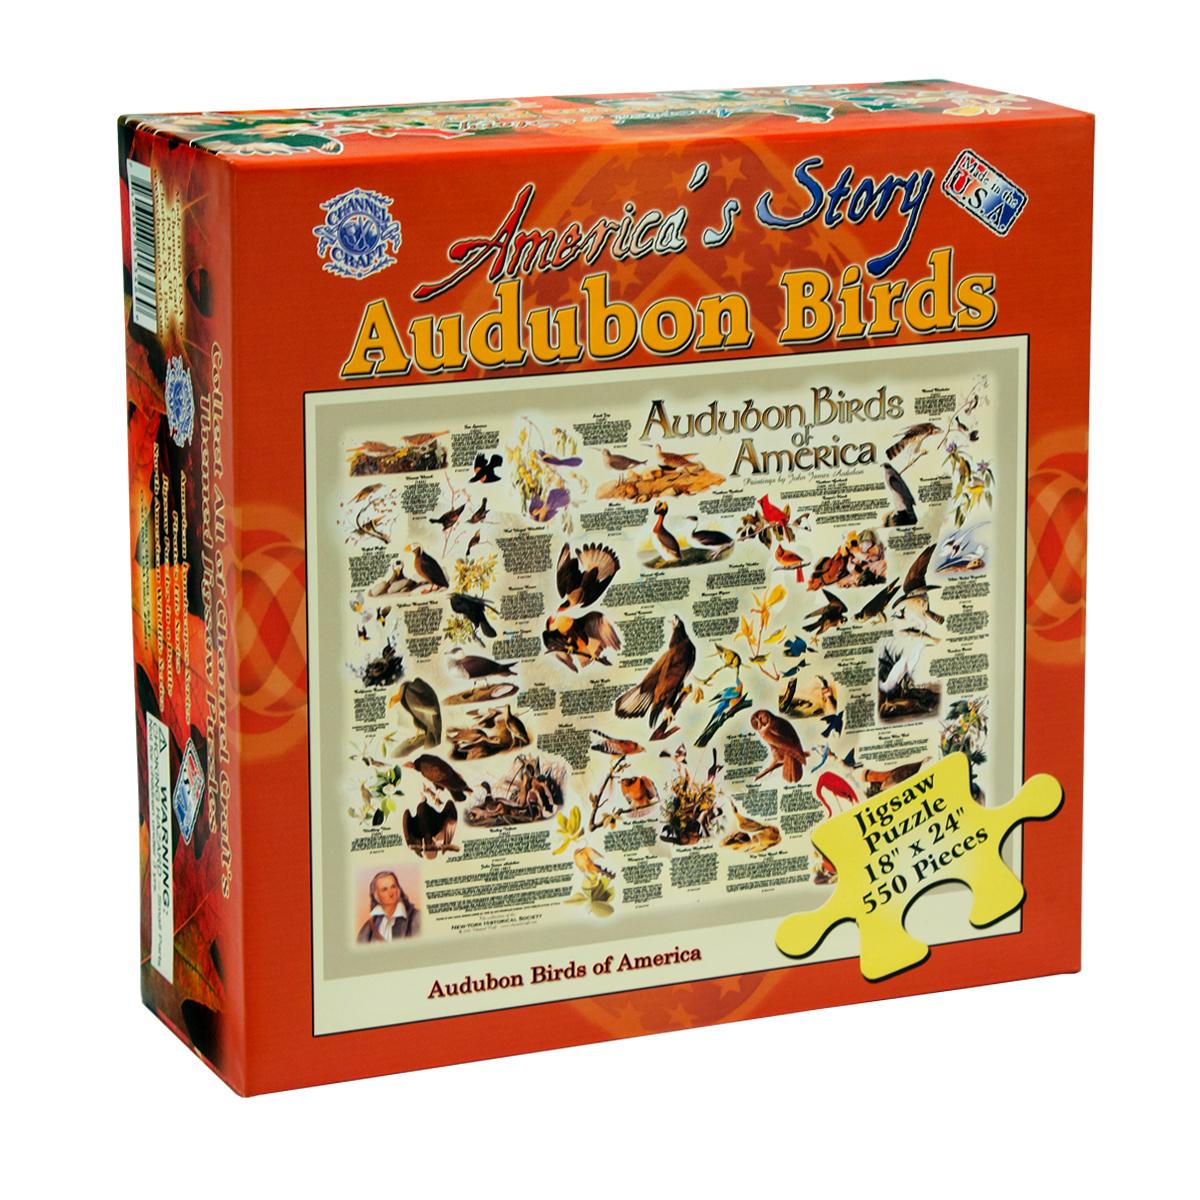 Audubon Birds of America Birds Jigsaw Puzzle